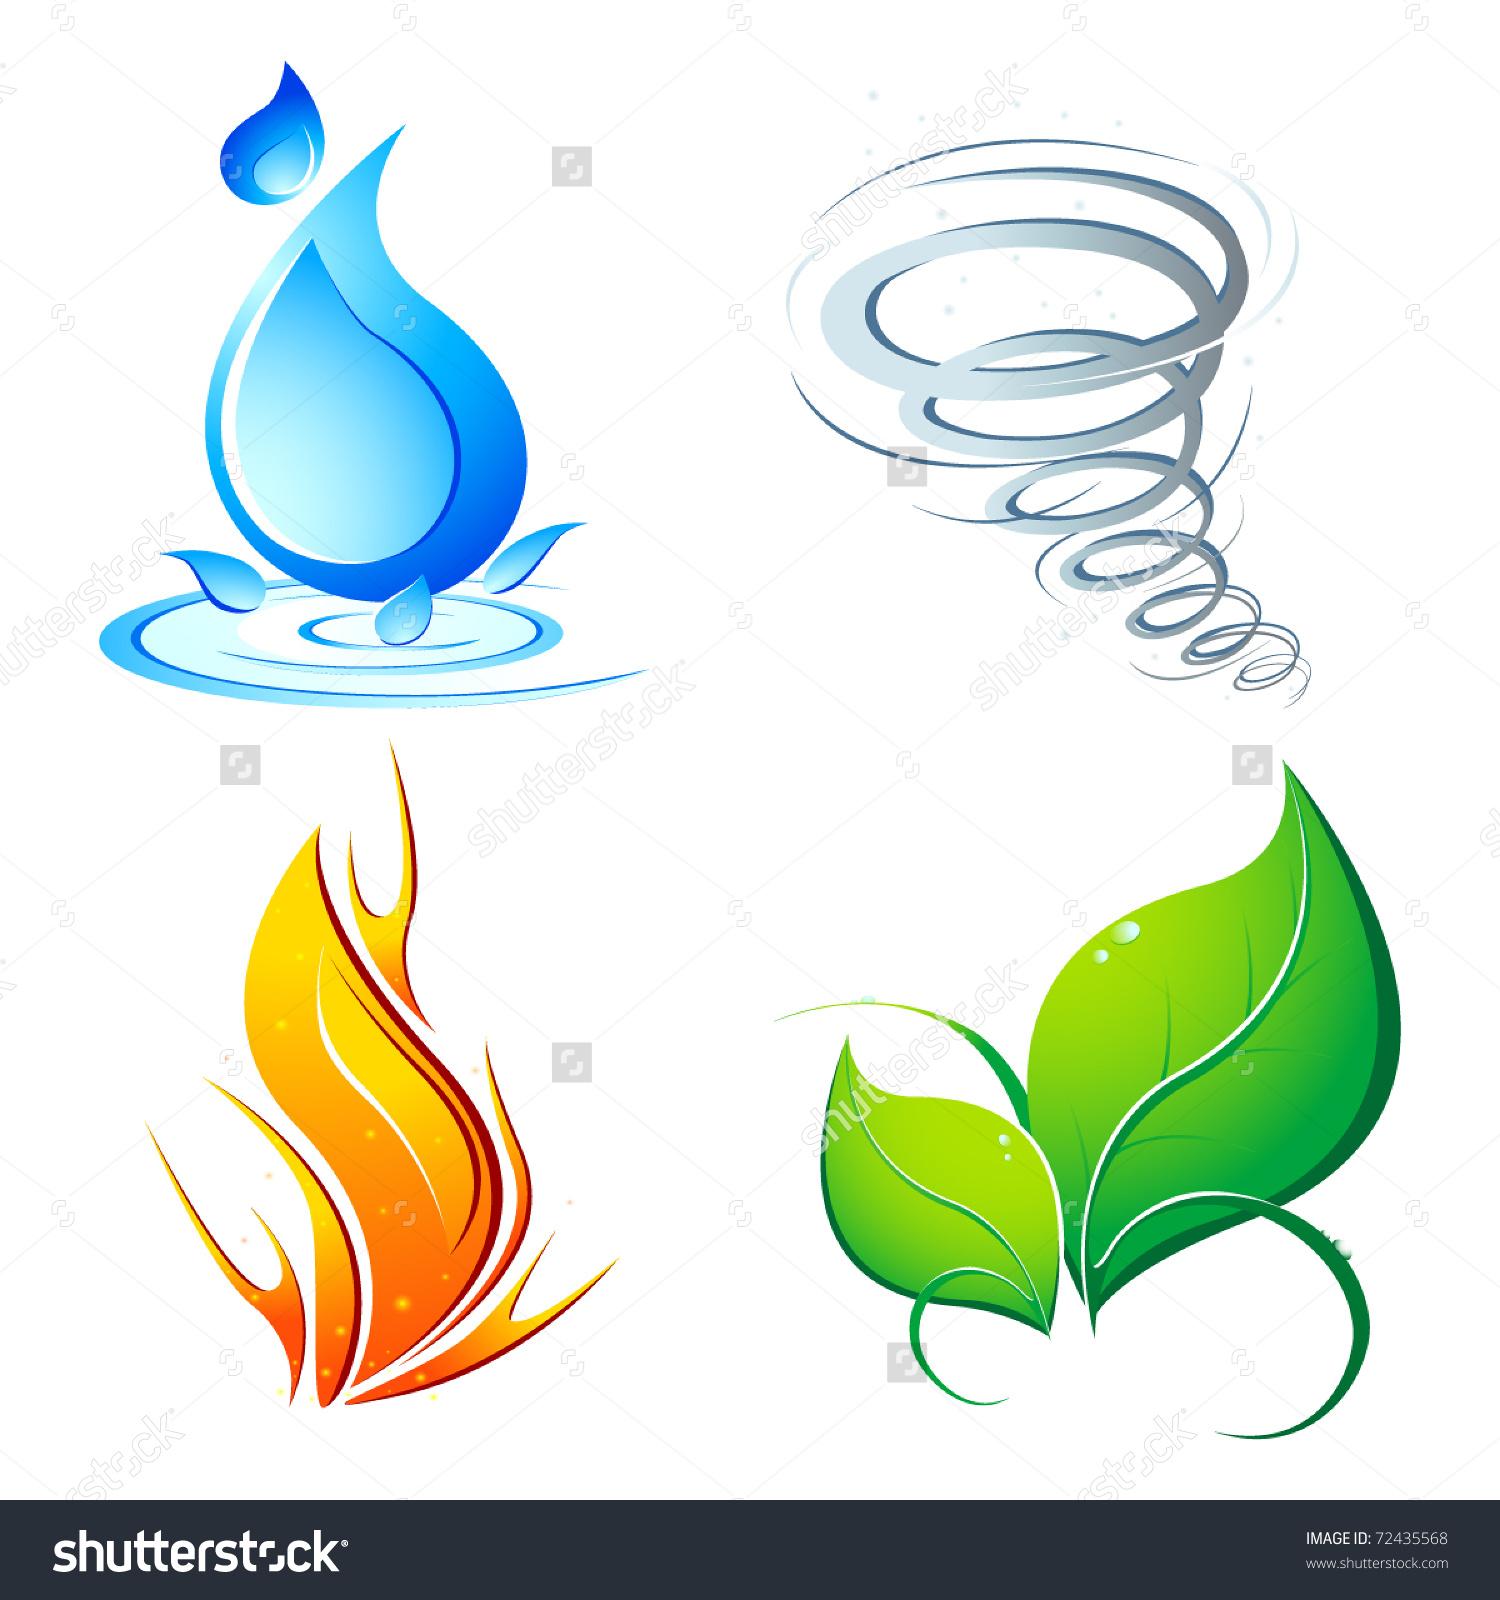 Earth fire air water clipart.